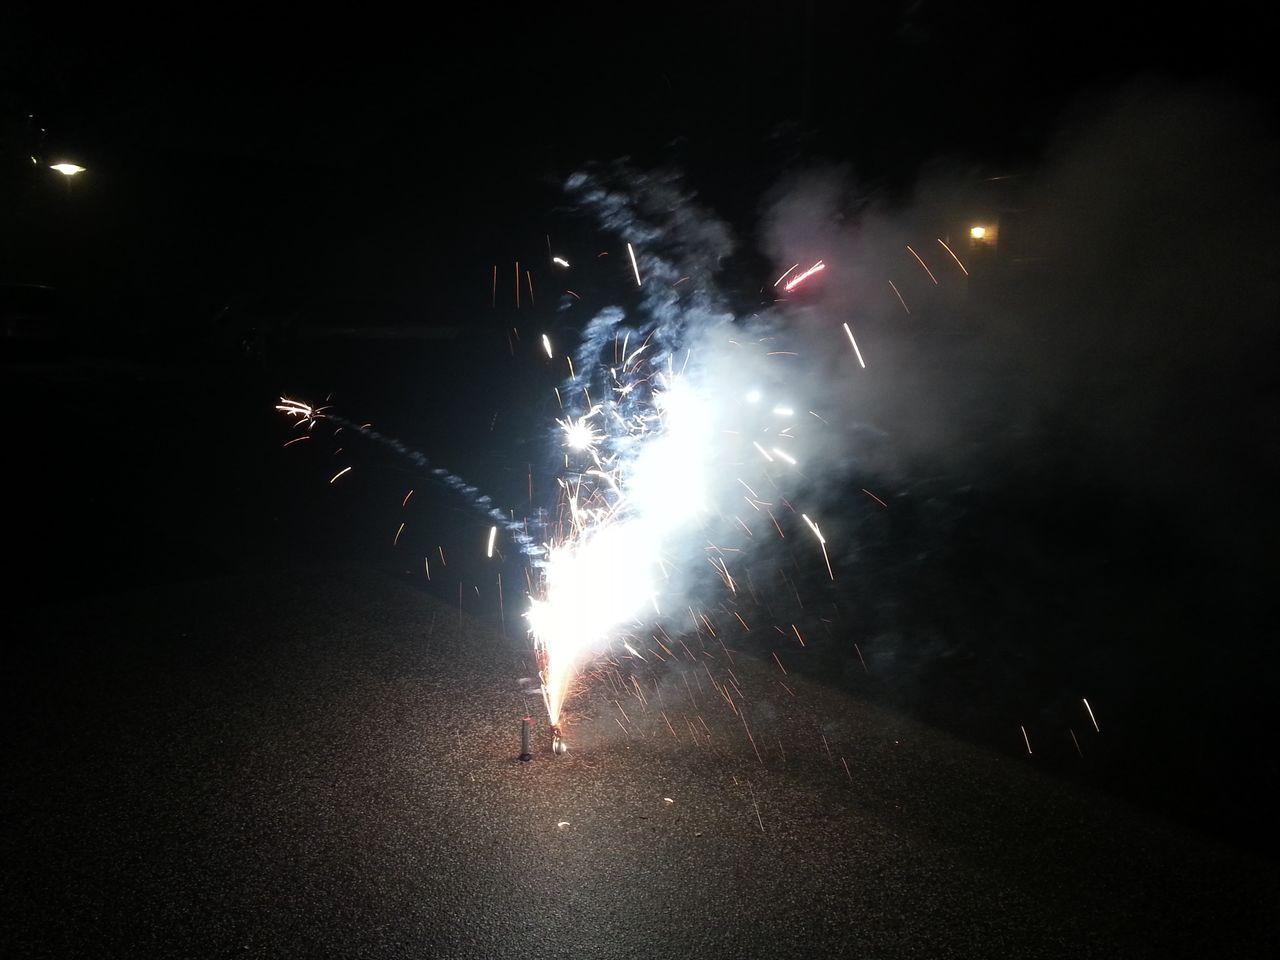 Atmosphere Atmospheric Mood Burning Dark Fire Flame Glowing Heat Heat - Temperature Illuminated Night Outdoors Shiny Smoke Sylvester